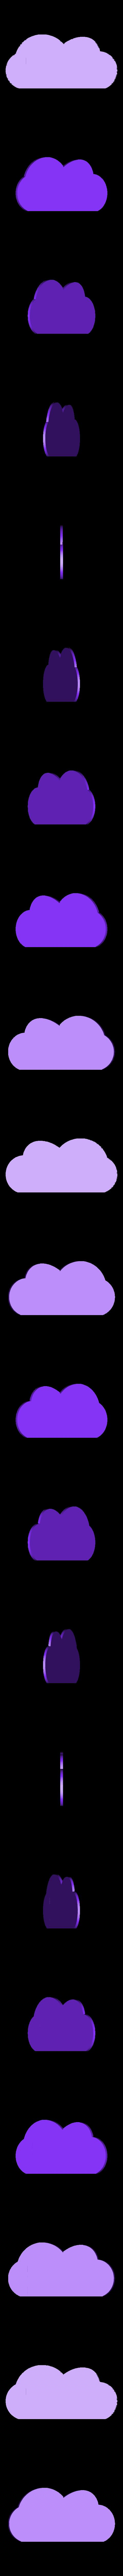 nuage .stl Download STL file rain fall • 3D printable template, catf3d